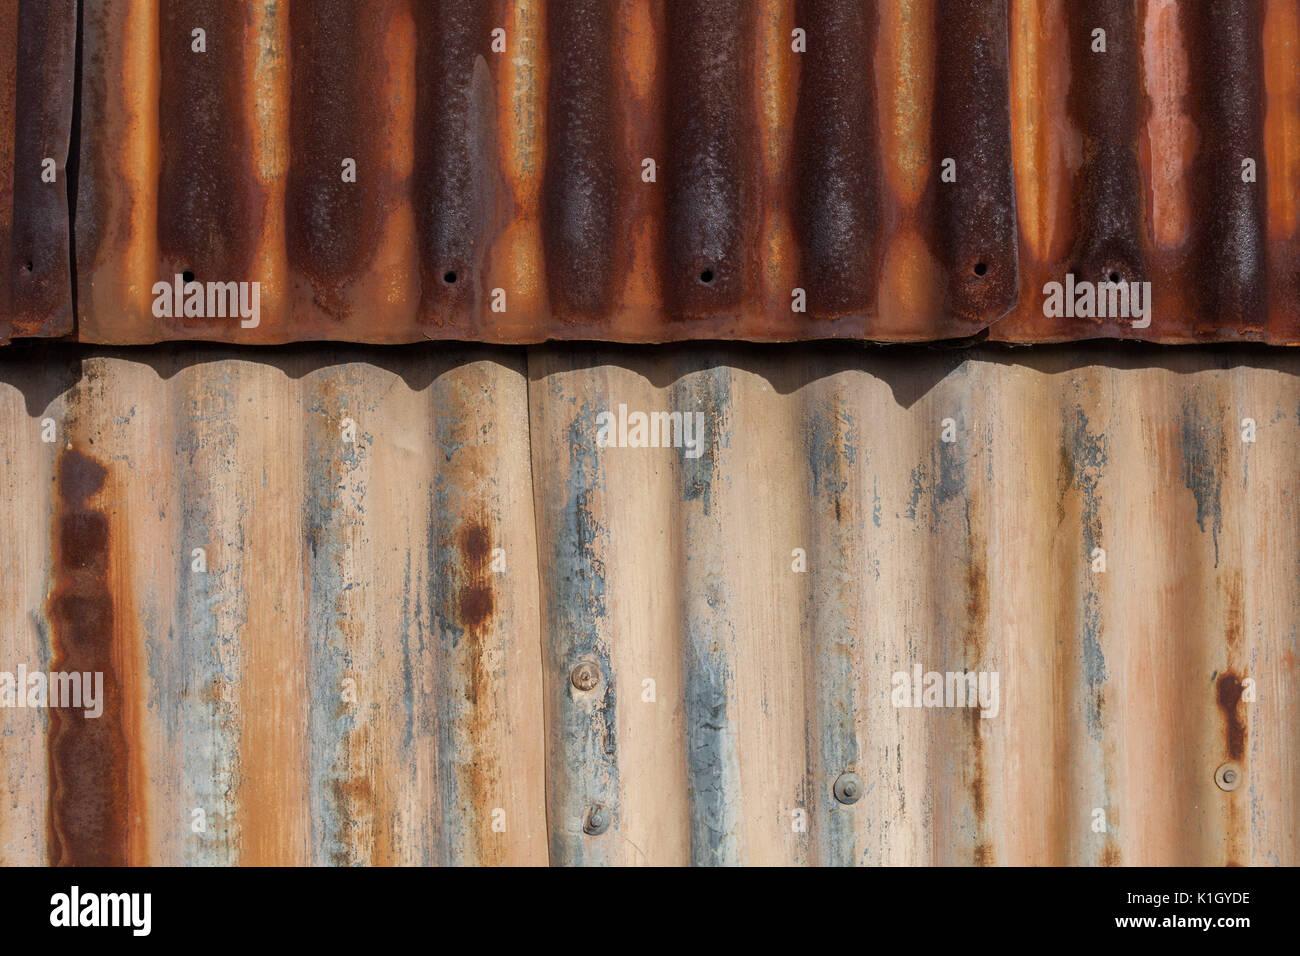 Rusty galvanized iron sheets background pattern - Stock Image